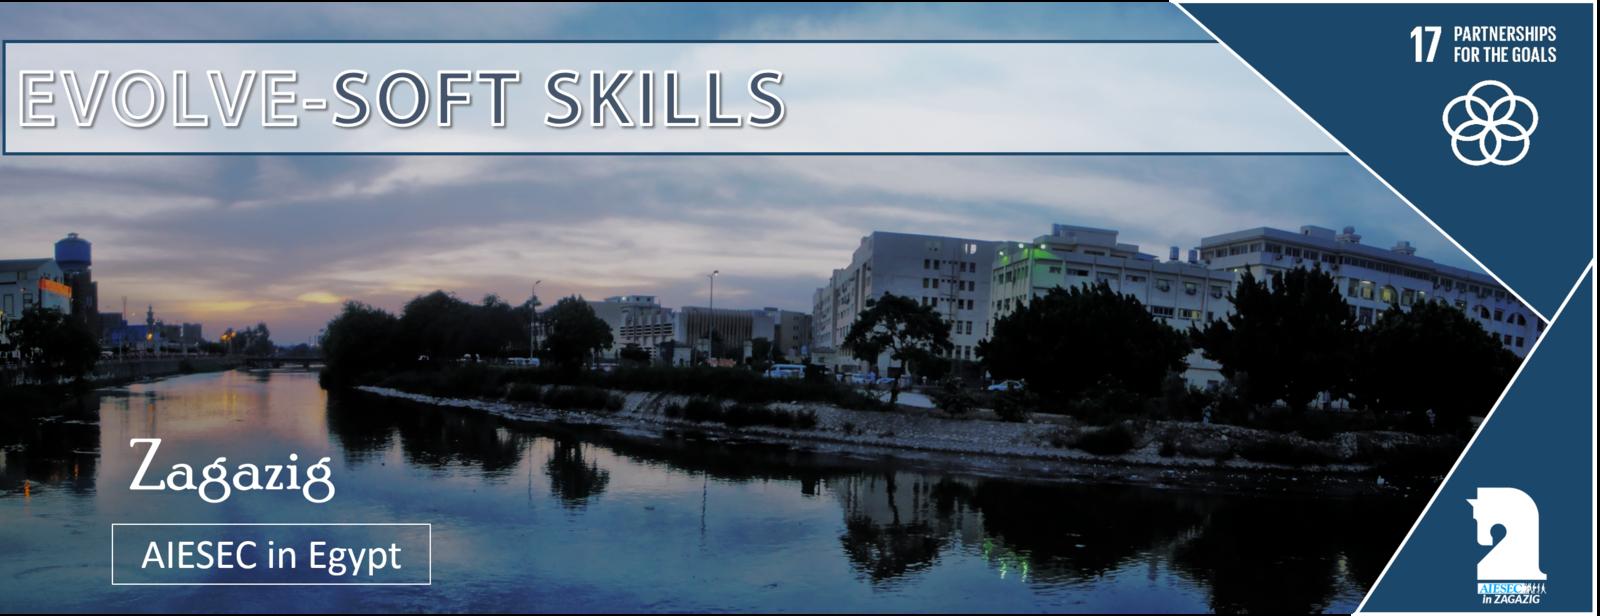 Evolve-Soft Skills opportunity in Egypt #17